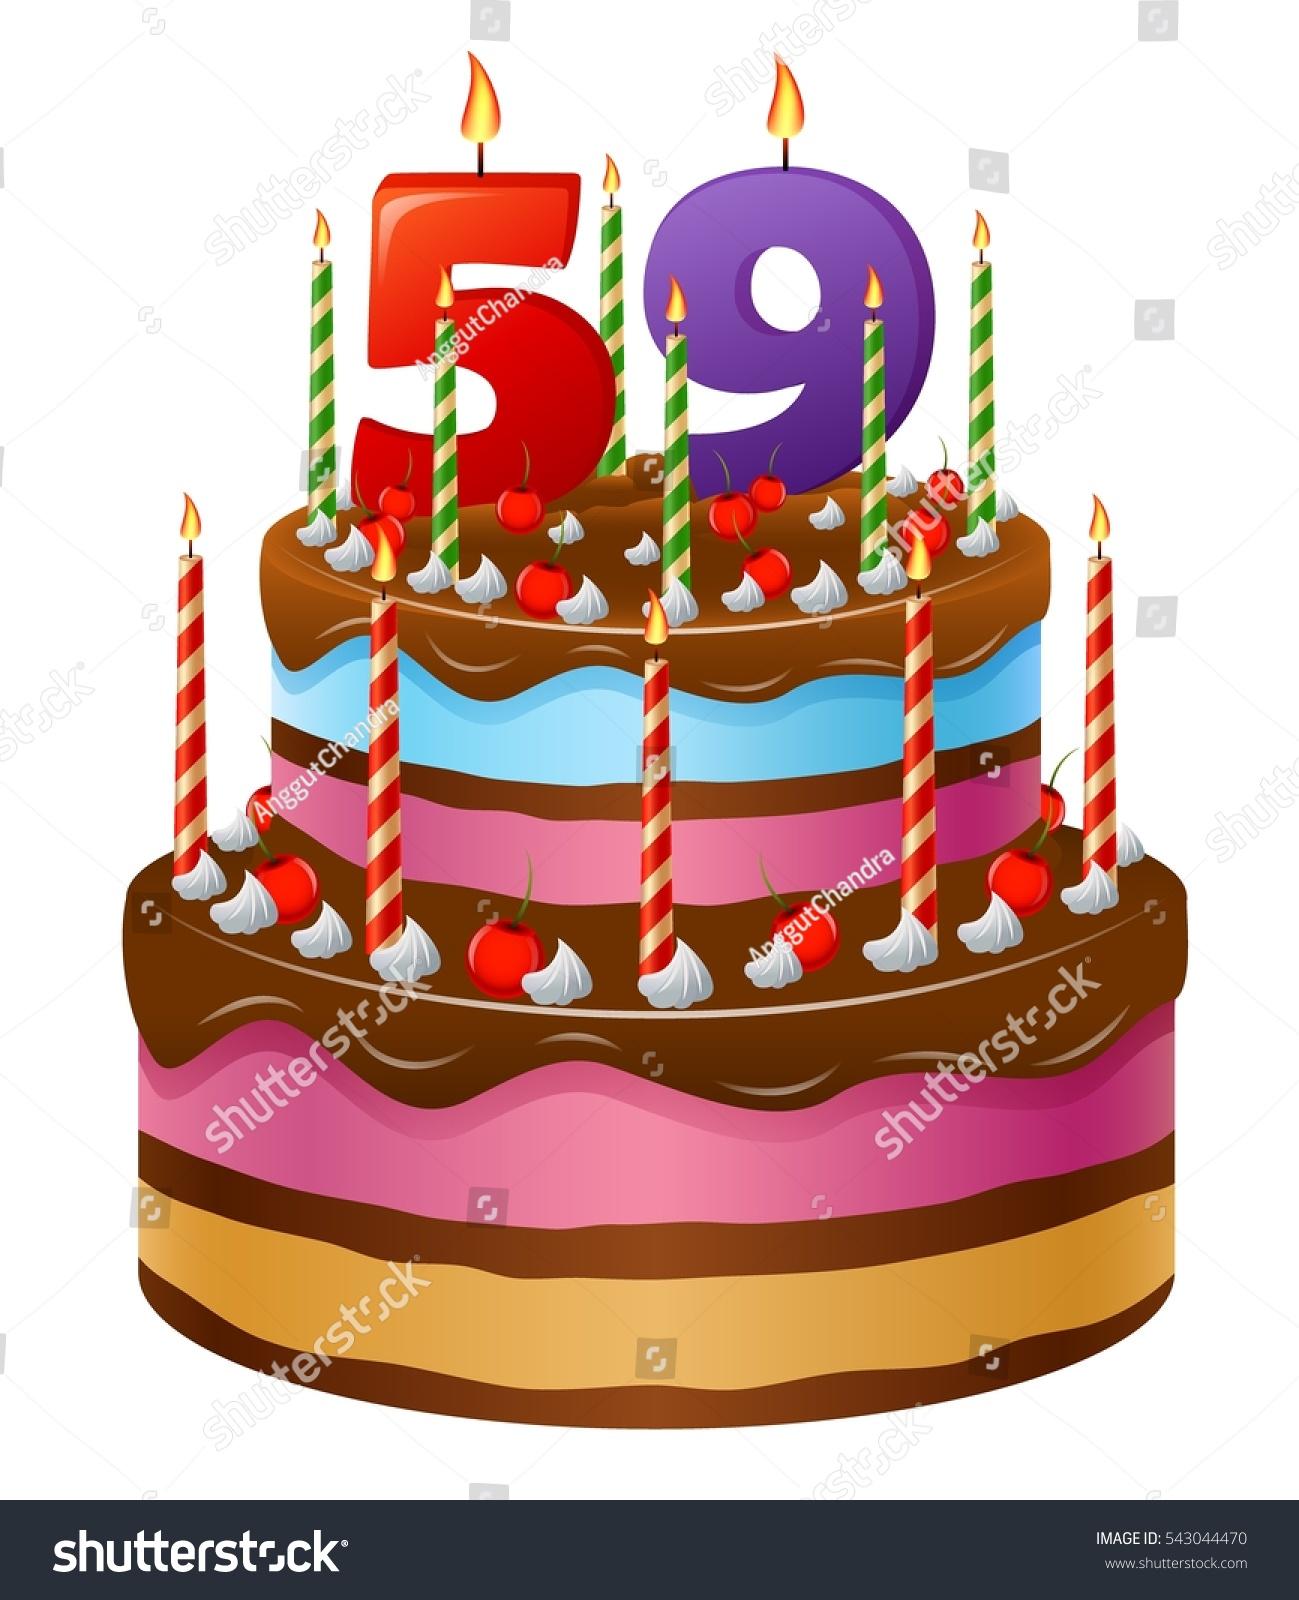 Happy Birthday Cake 59 Stock Illustration 543044470 Shutterstock